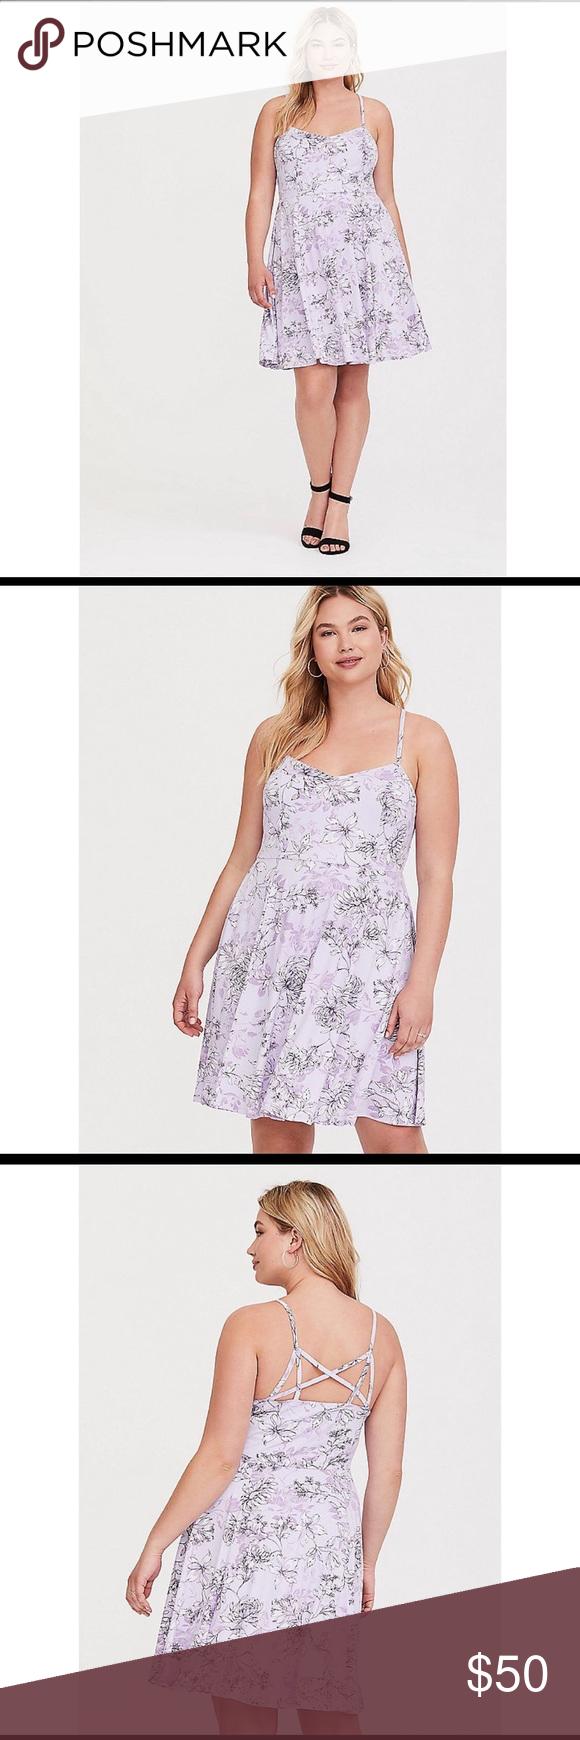 921798e4712 Torrid Lavender Floral Jersey Knit Skater Dress NWT Size 1 DETAILS A  stretchy skater dress has